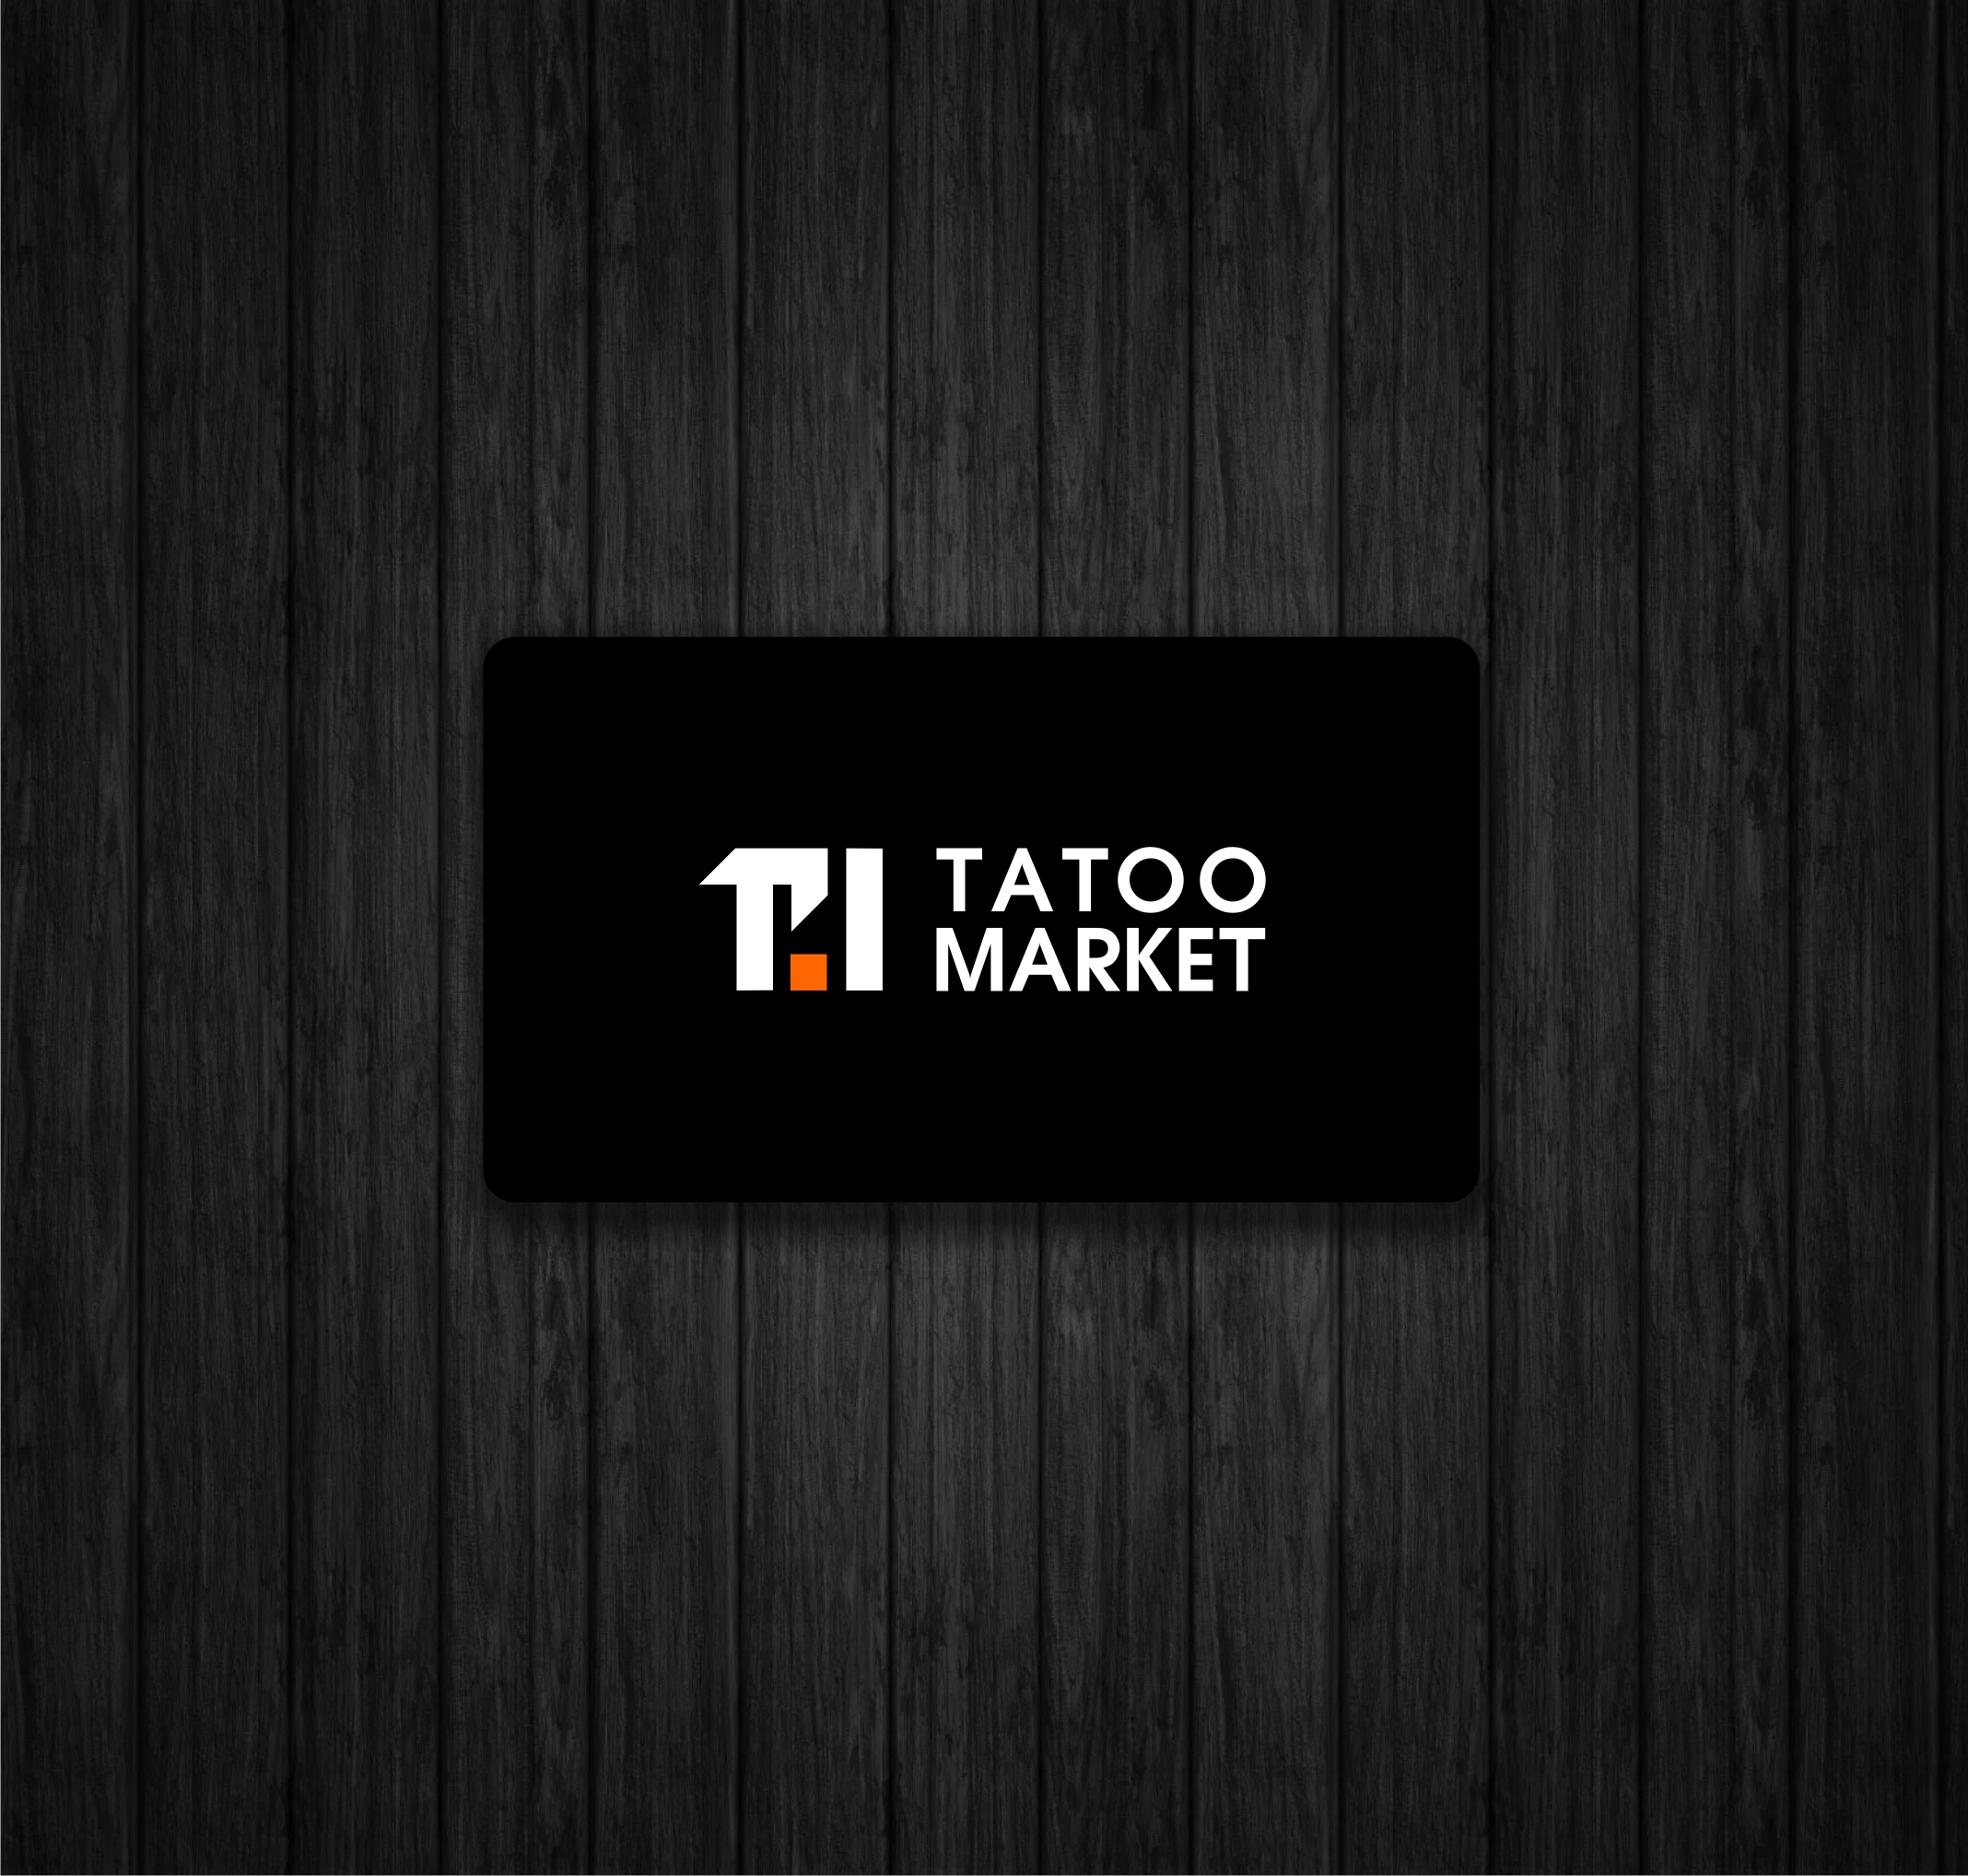 Редизайн логотипа магазина тату оборудования TattooMarket.ru фото f_5515c4076c25e6f3.jpg